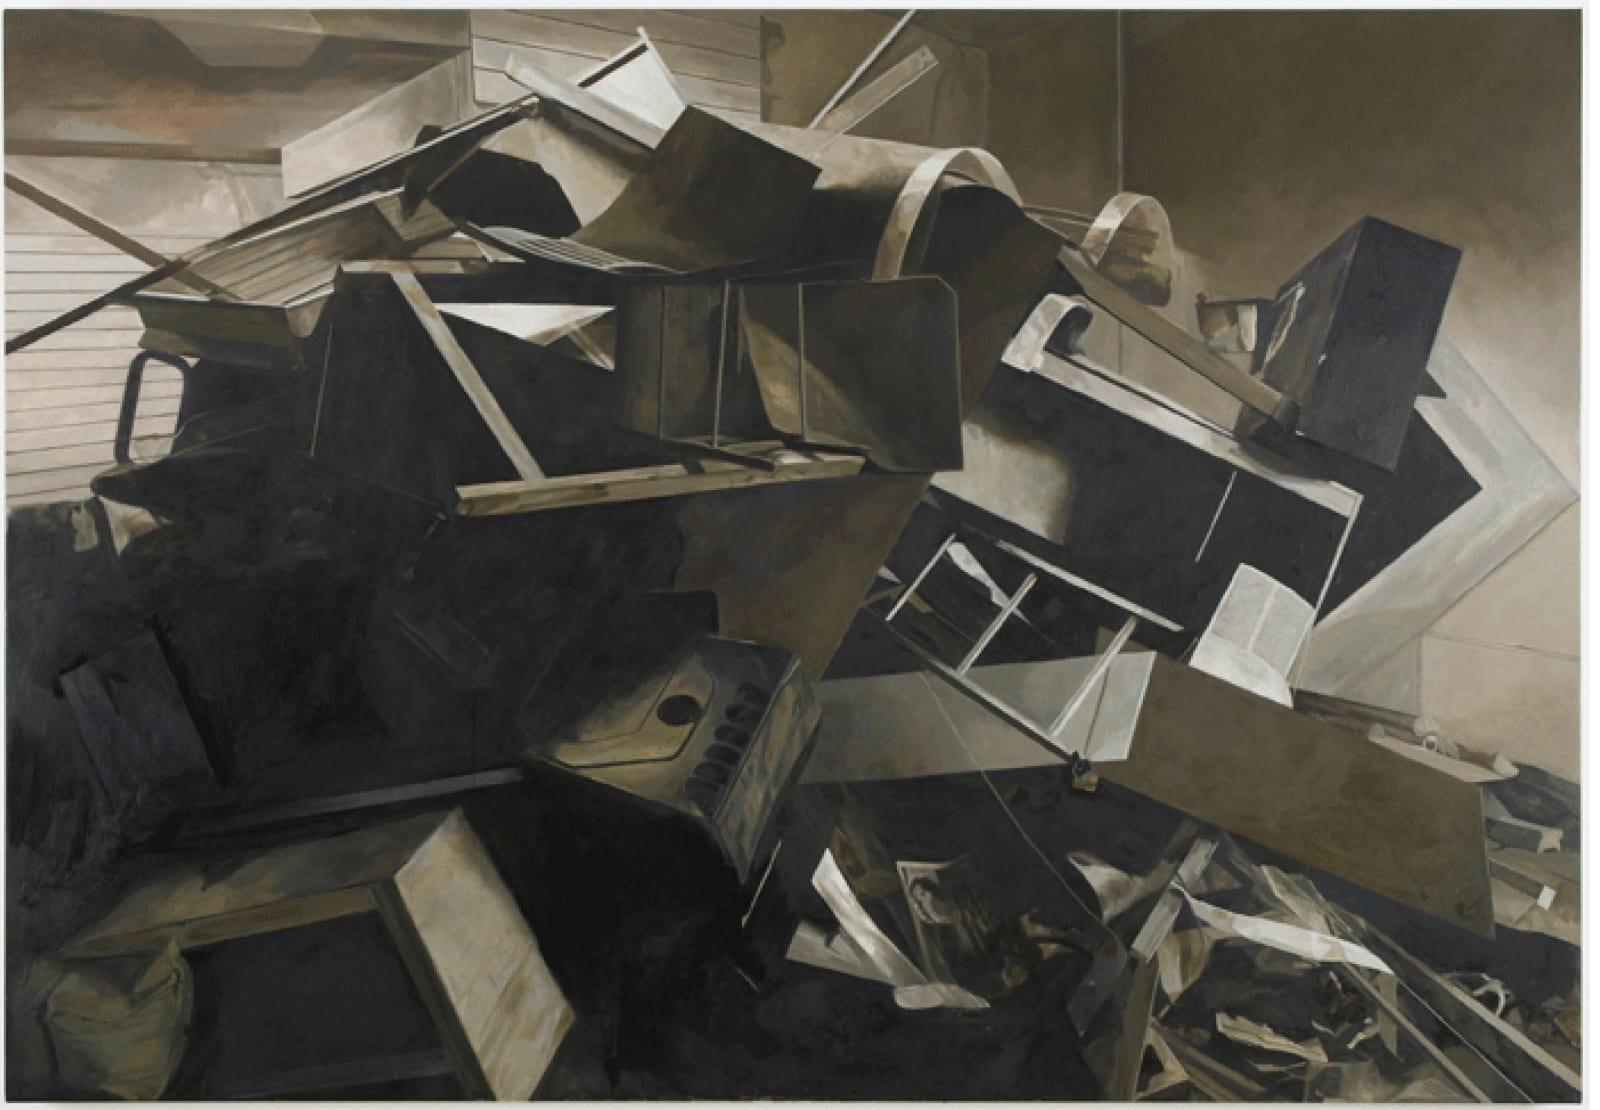 Stuart Brisley, The Missing Text, Interregnum 2, 2012